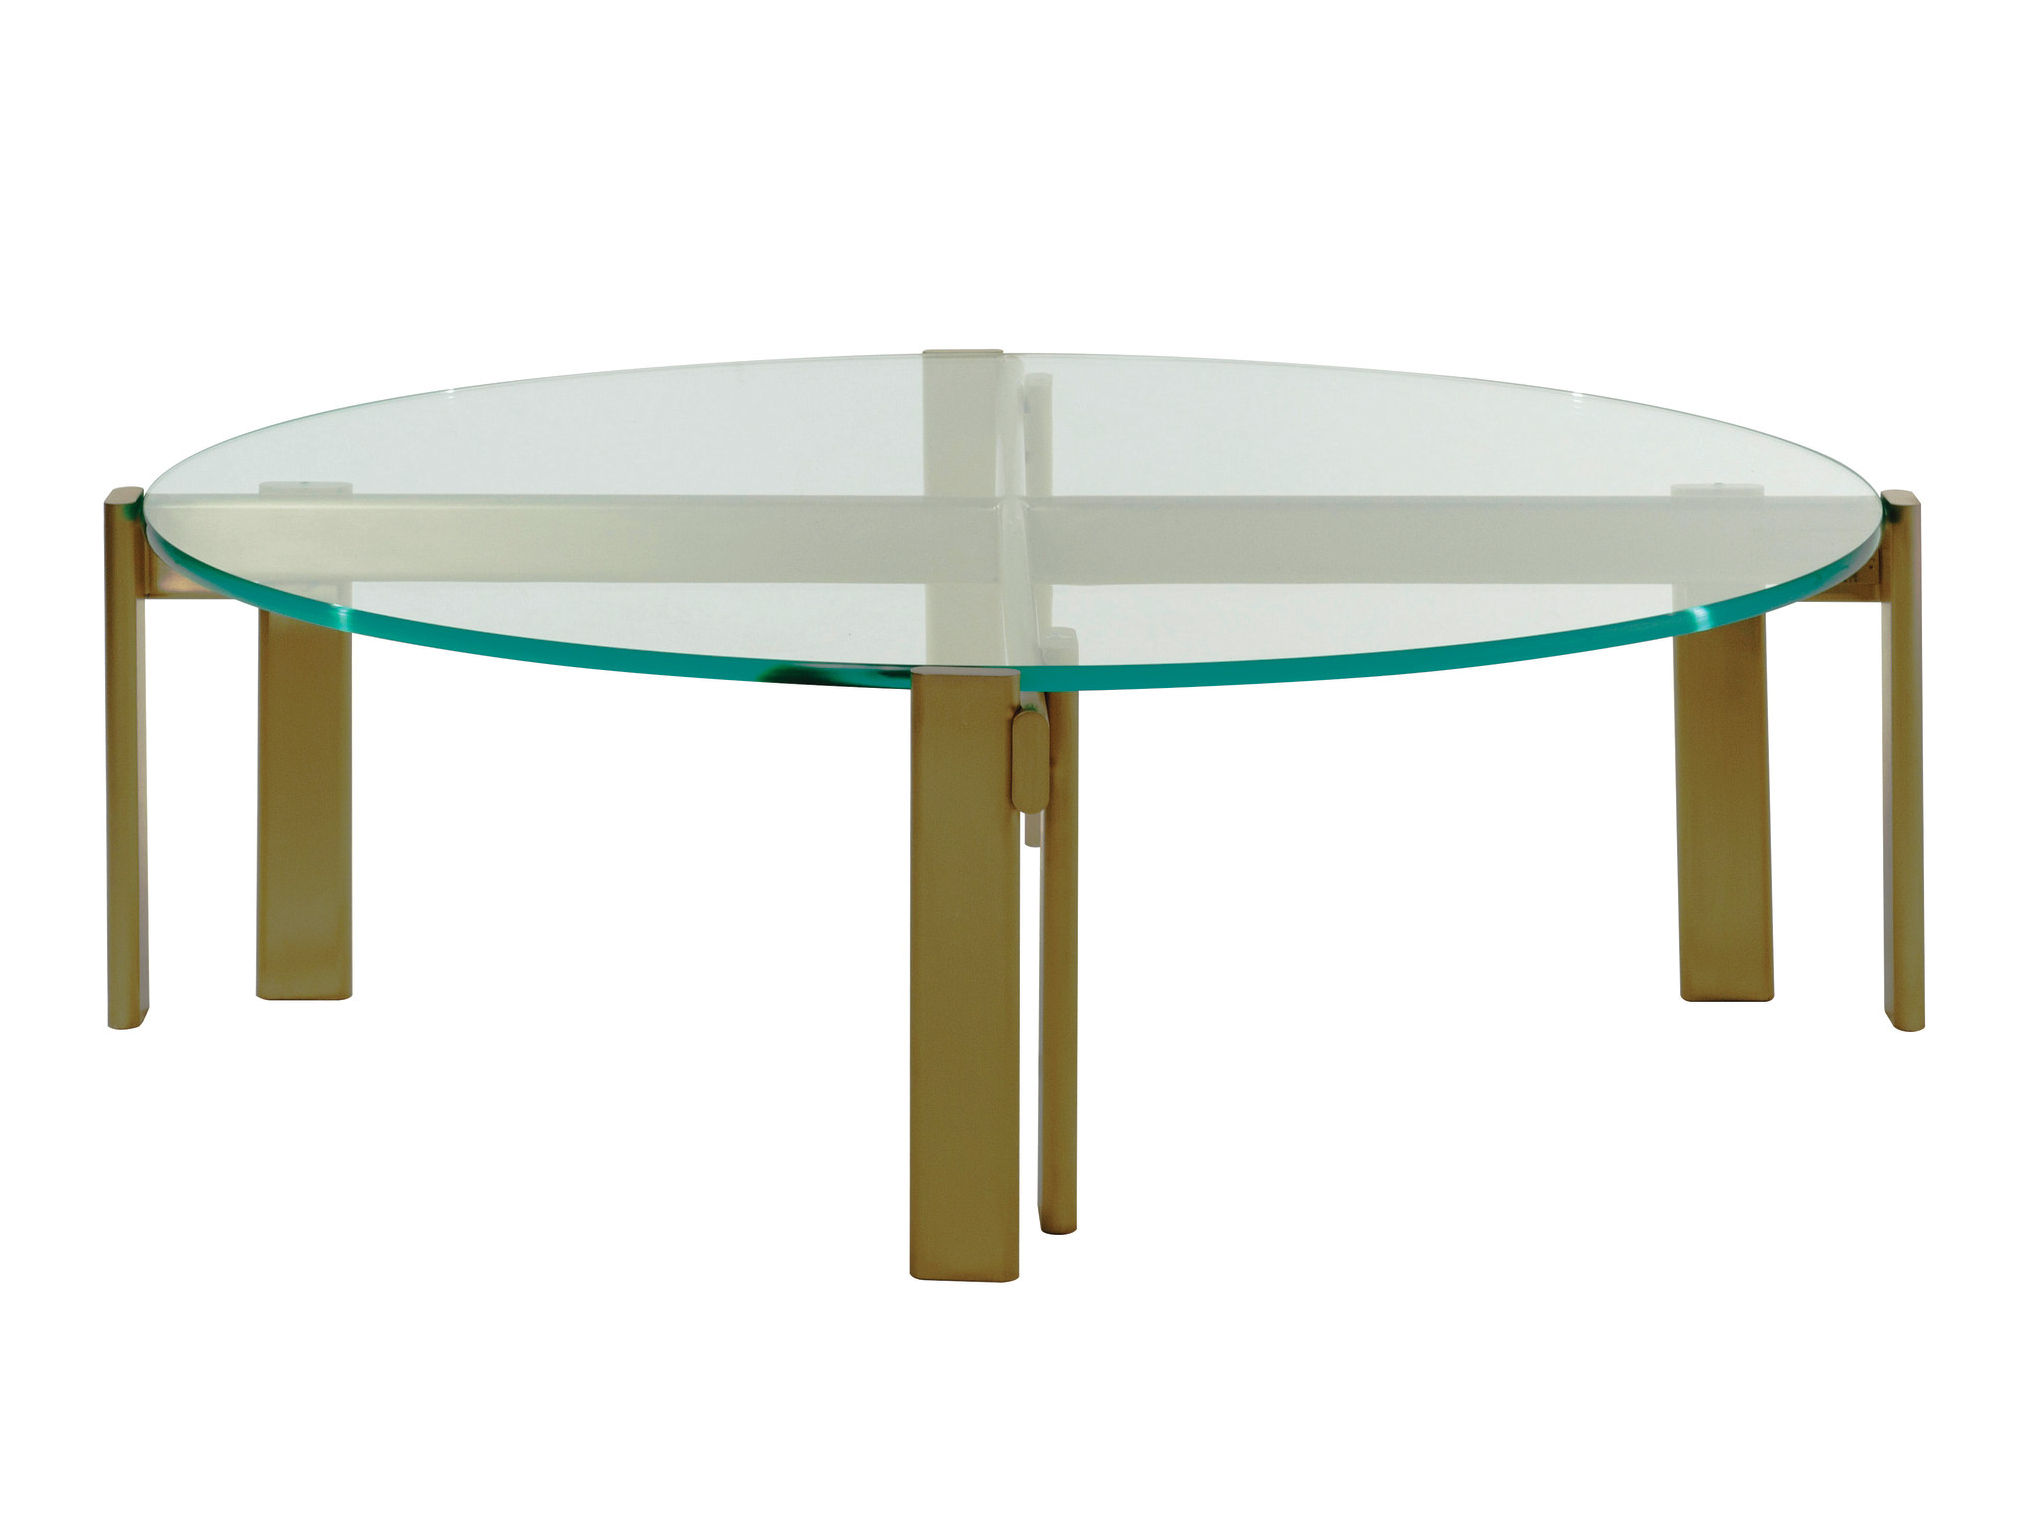 Roche Bobois Tables De Salon | Tables Basses De Salon Roche Bobois ...